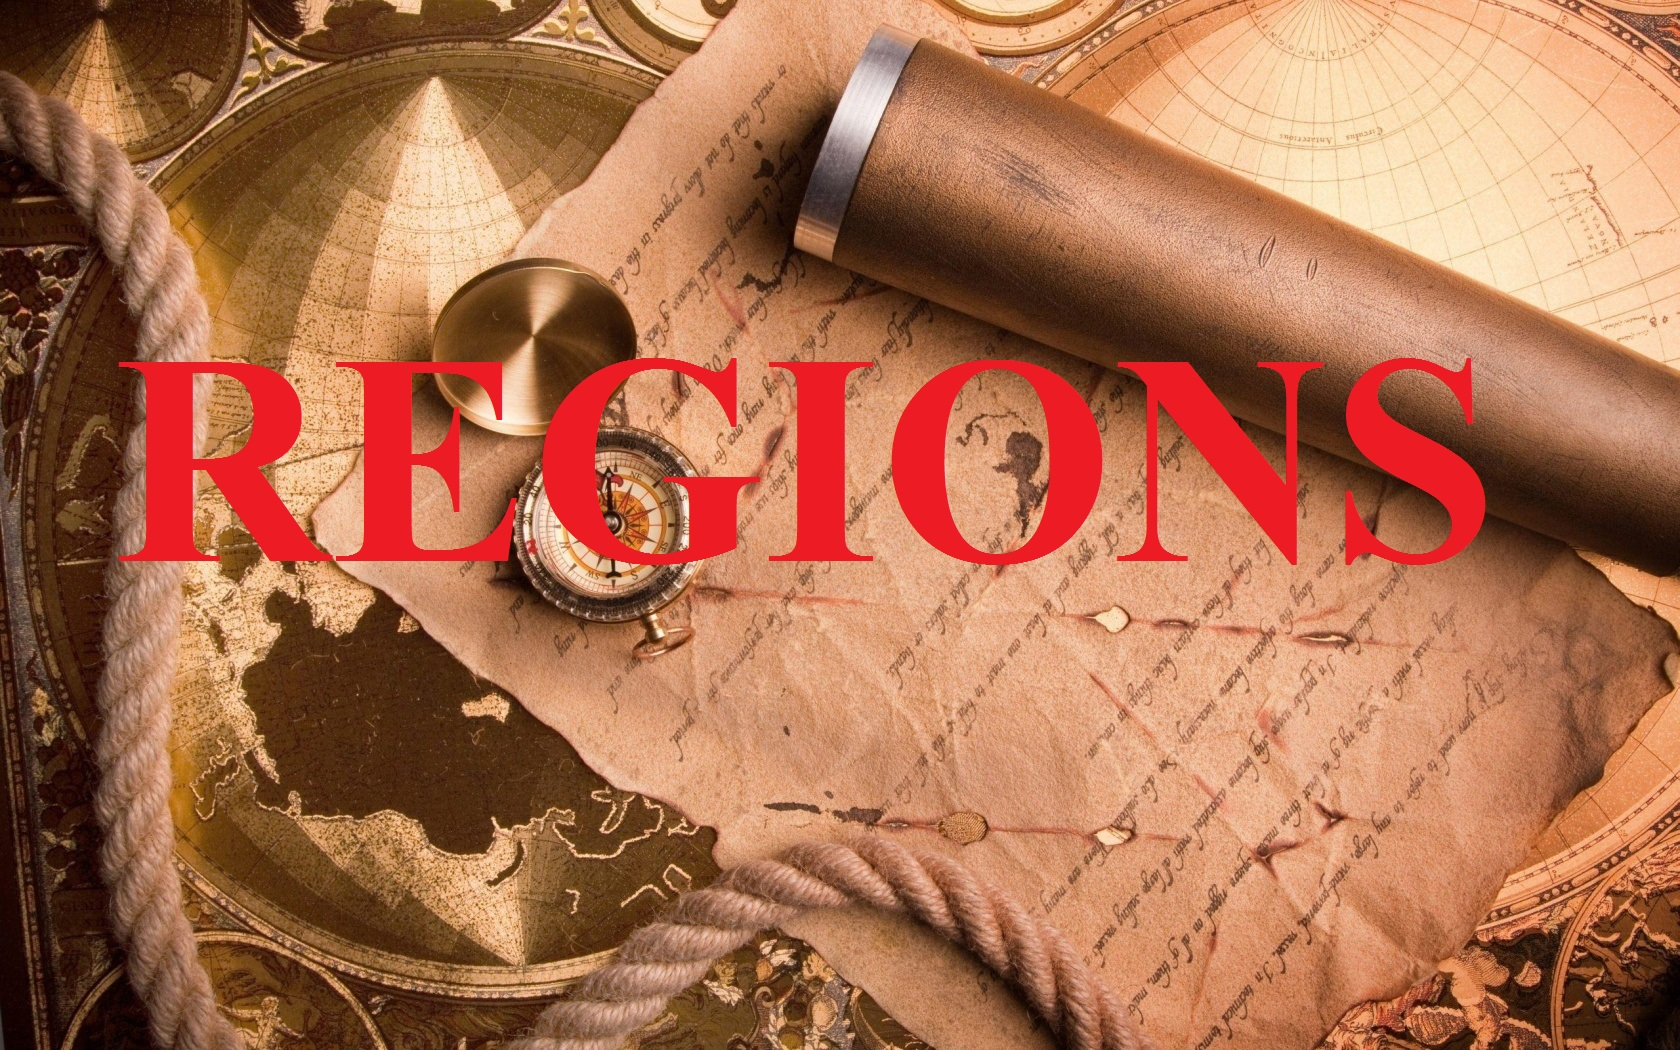 Regions.jpg</a>